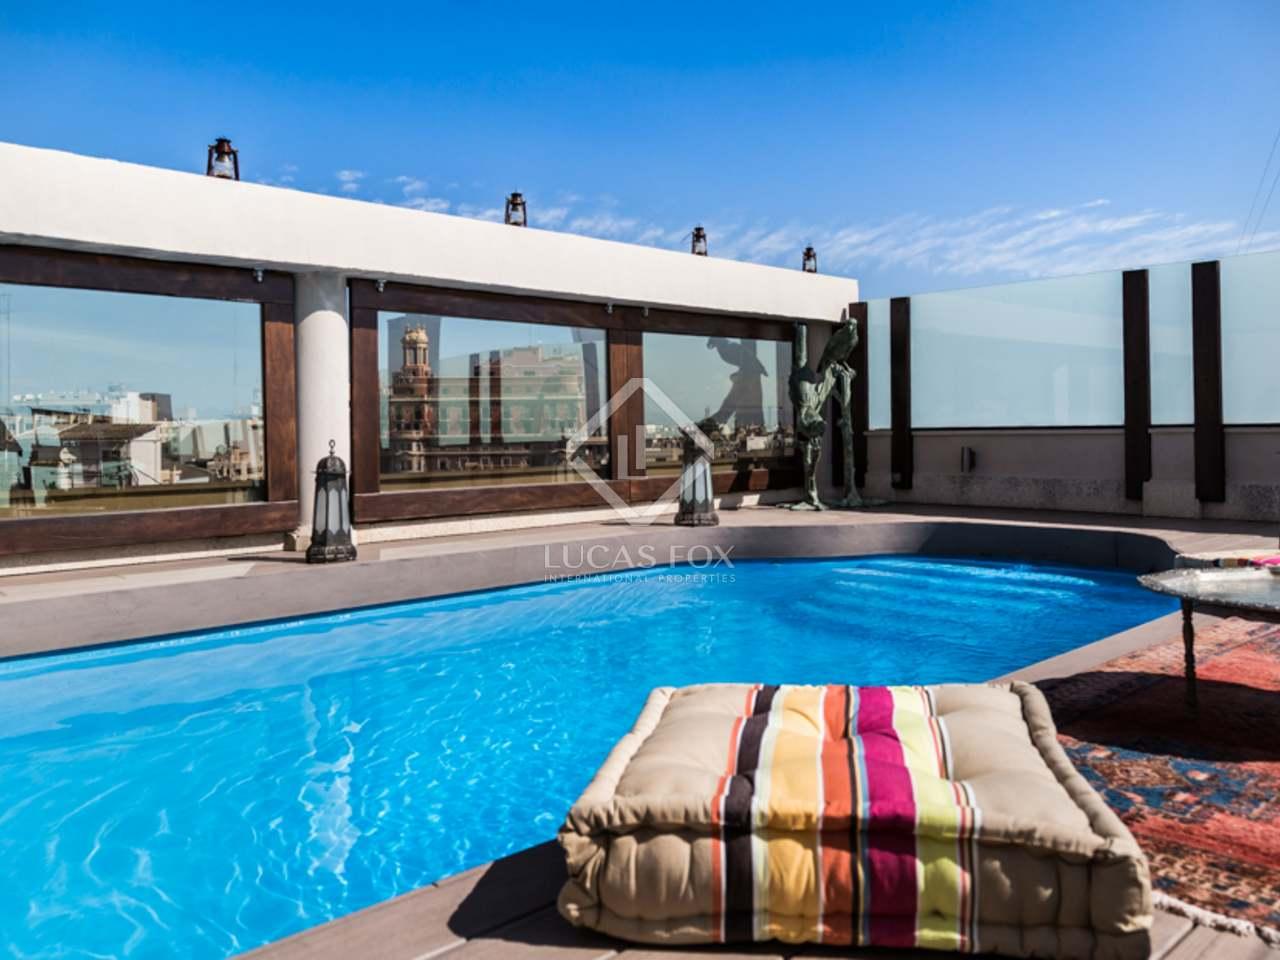 Penthouse de style oriental en vente avec piscine au for Vente de piscine